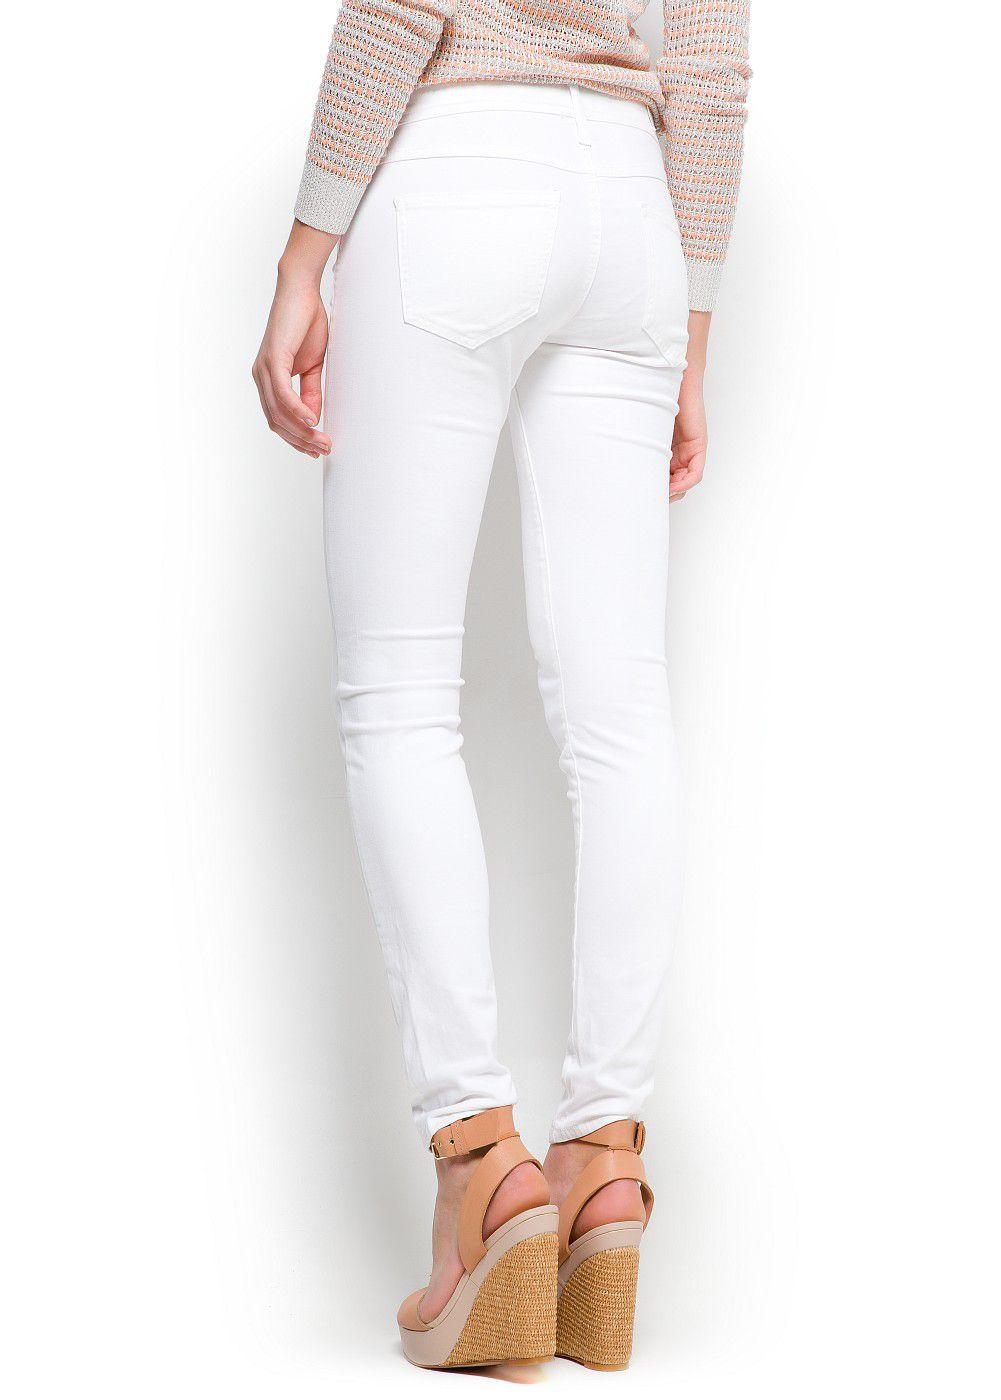 Mango Super Slim Jeans in White